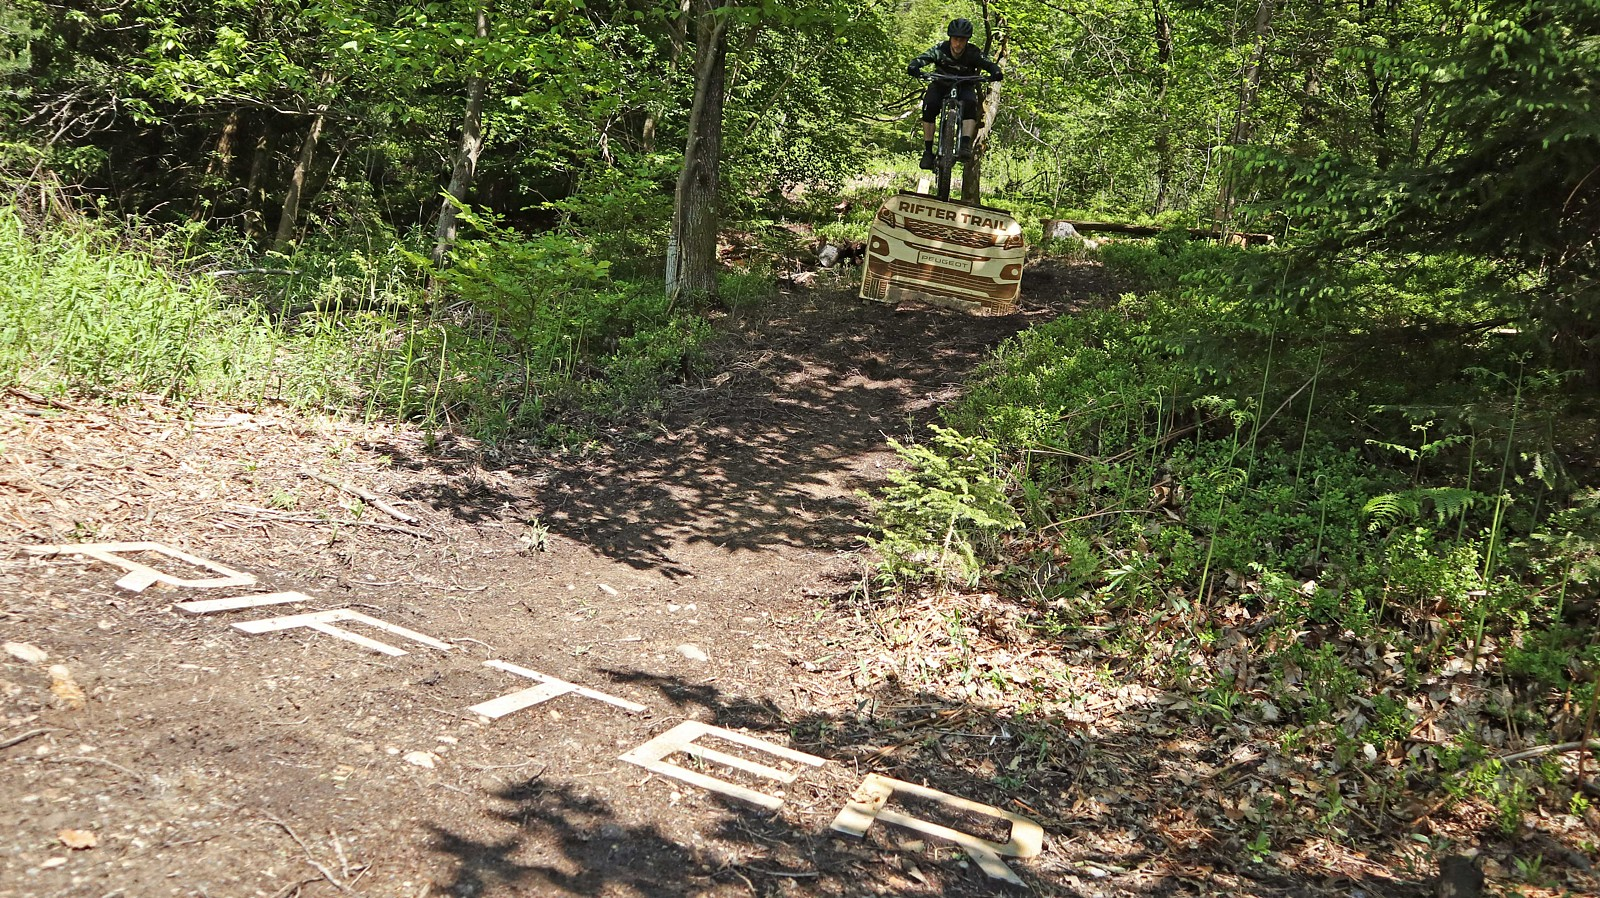 Golovec Rifter porsonmedia 01 - porson - Mountain Biking Pictures - Vital MTB